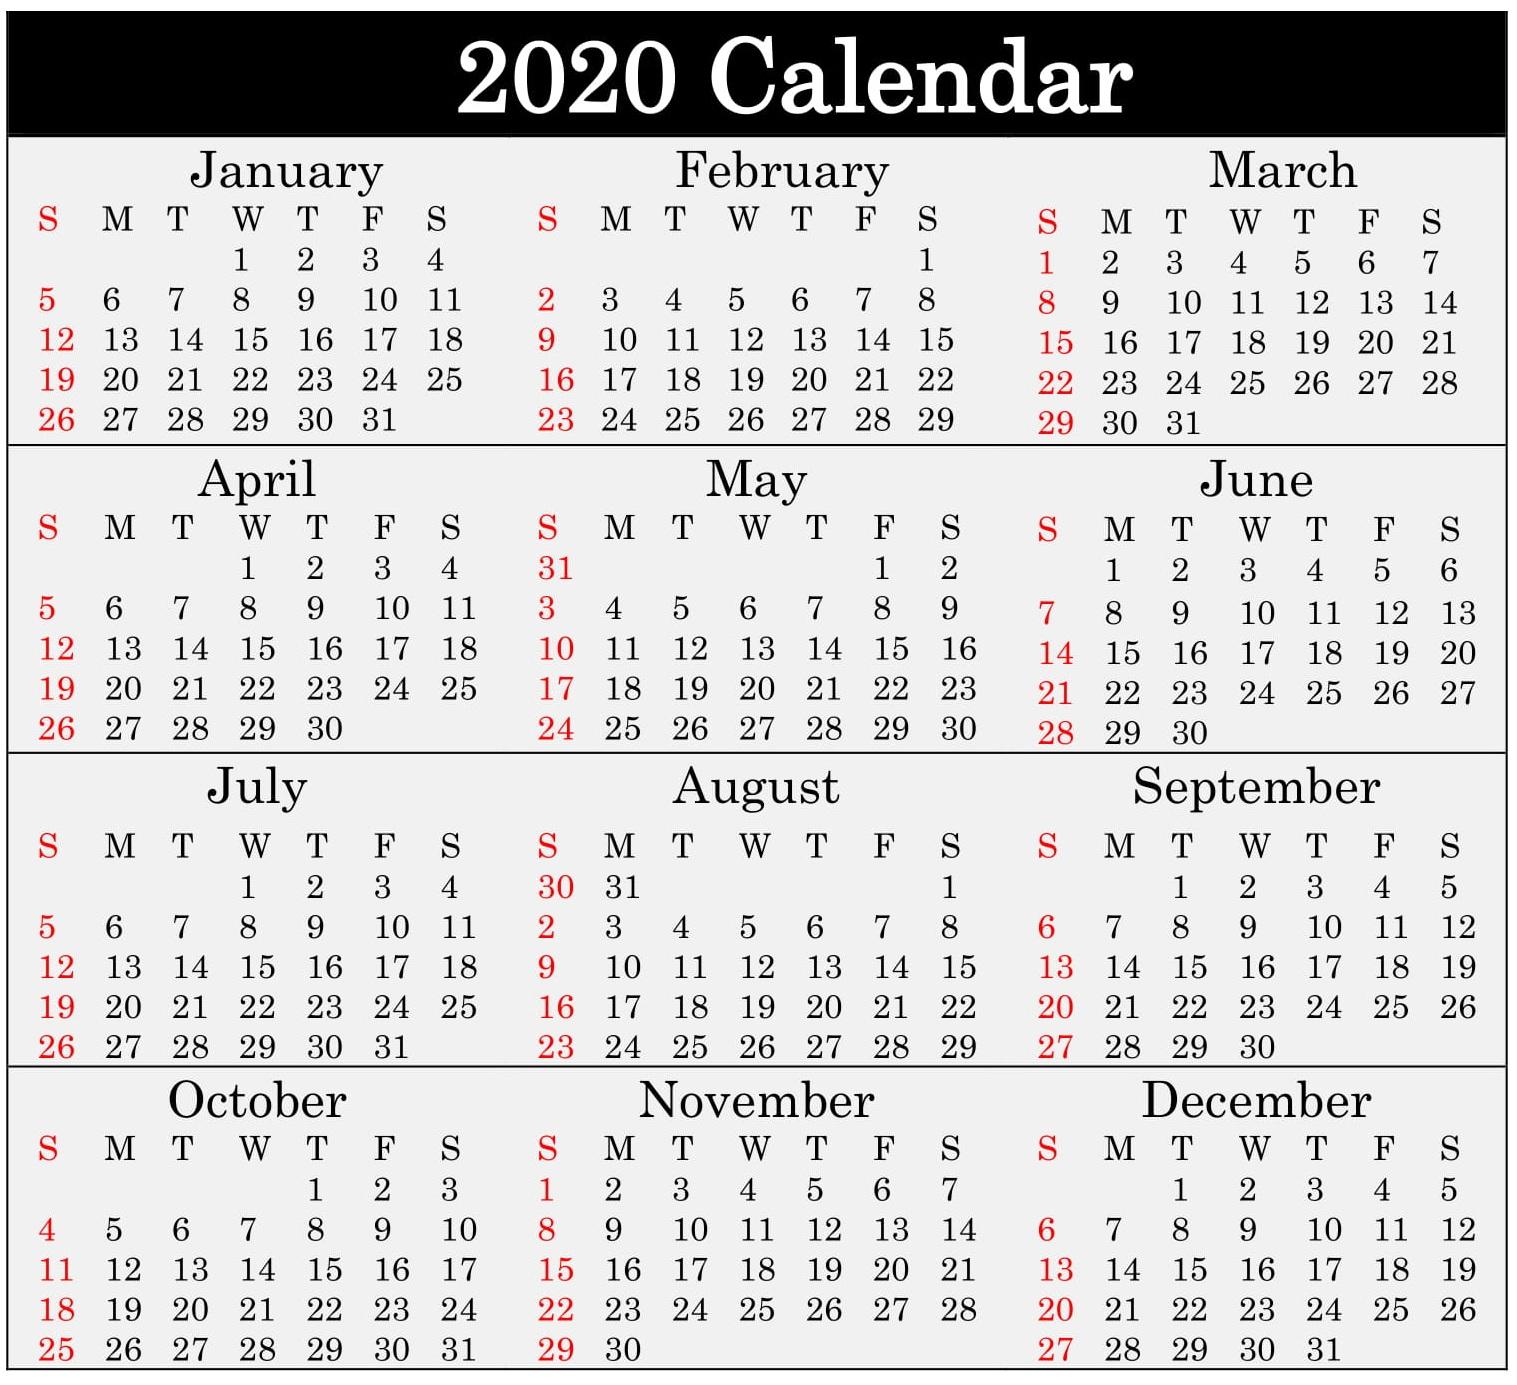 Printable 2020 Calendar Word Document  Latest Printable throughout Julian Date Calendar For 2020